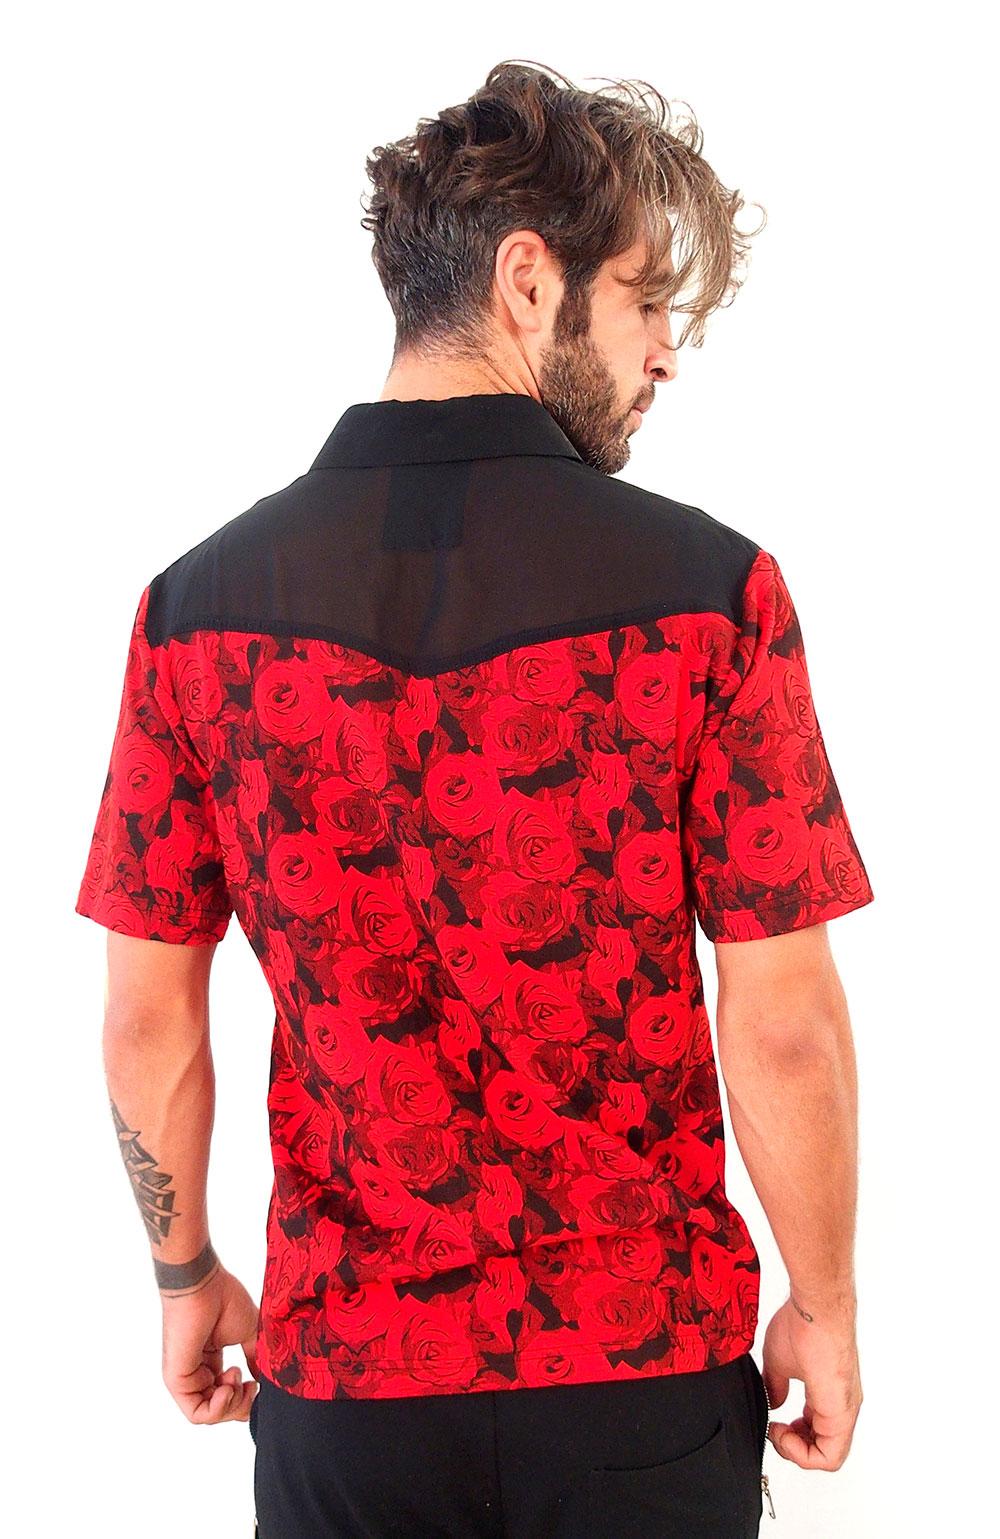 mens dress T-shirt red floral jersey and black silk Hi-Tek